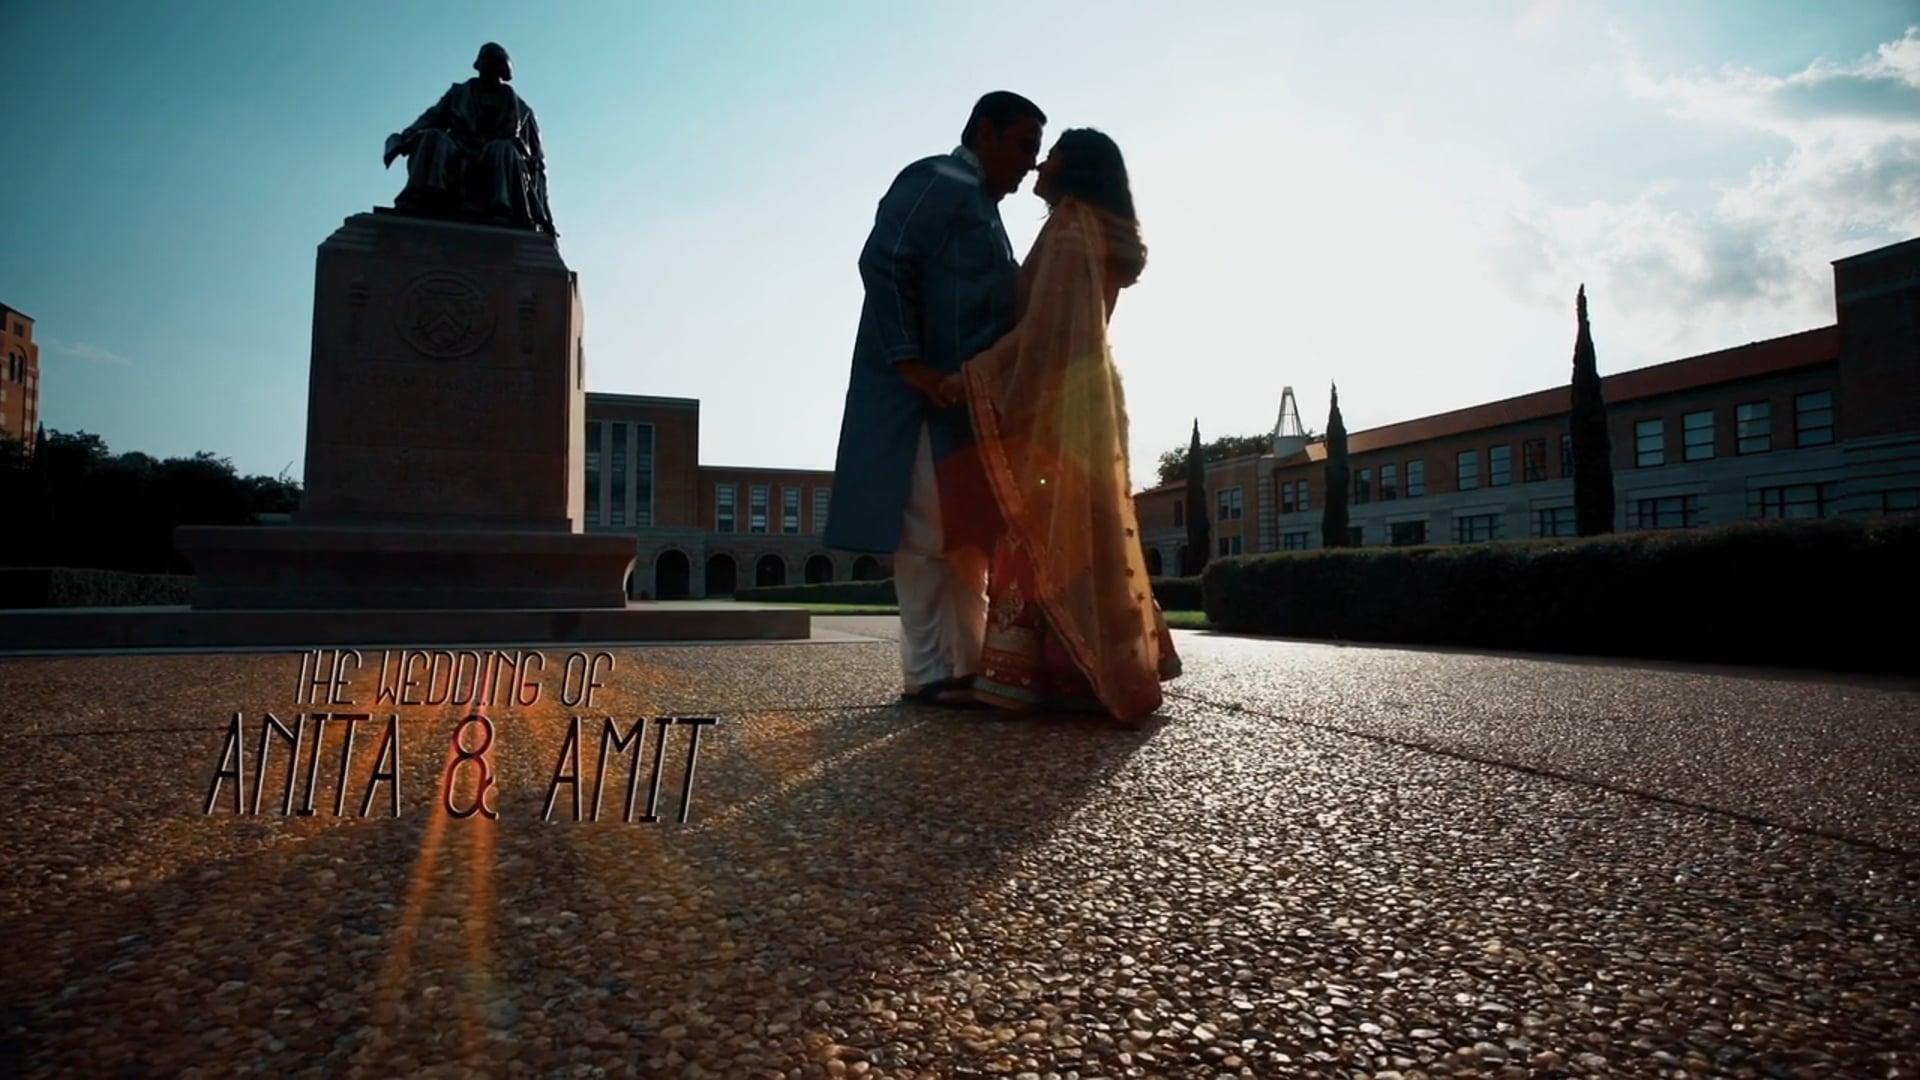 Anita & Amit Wedding Highlights.